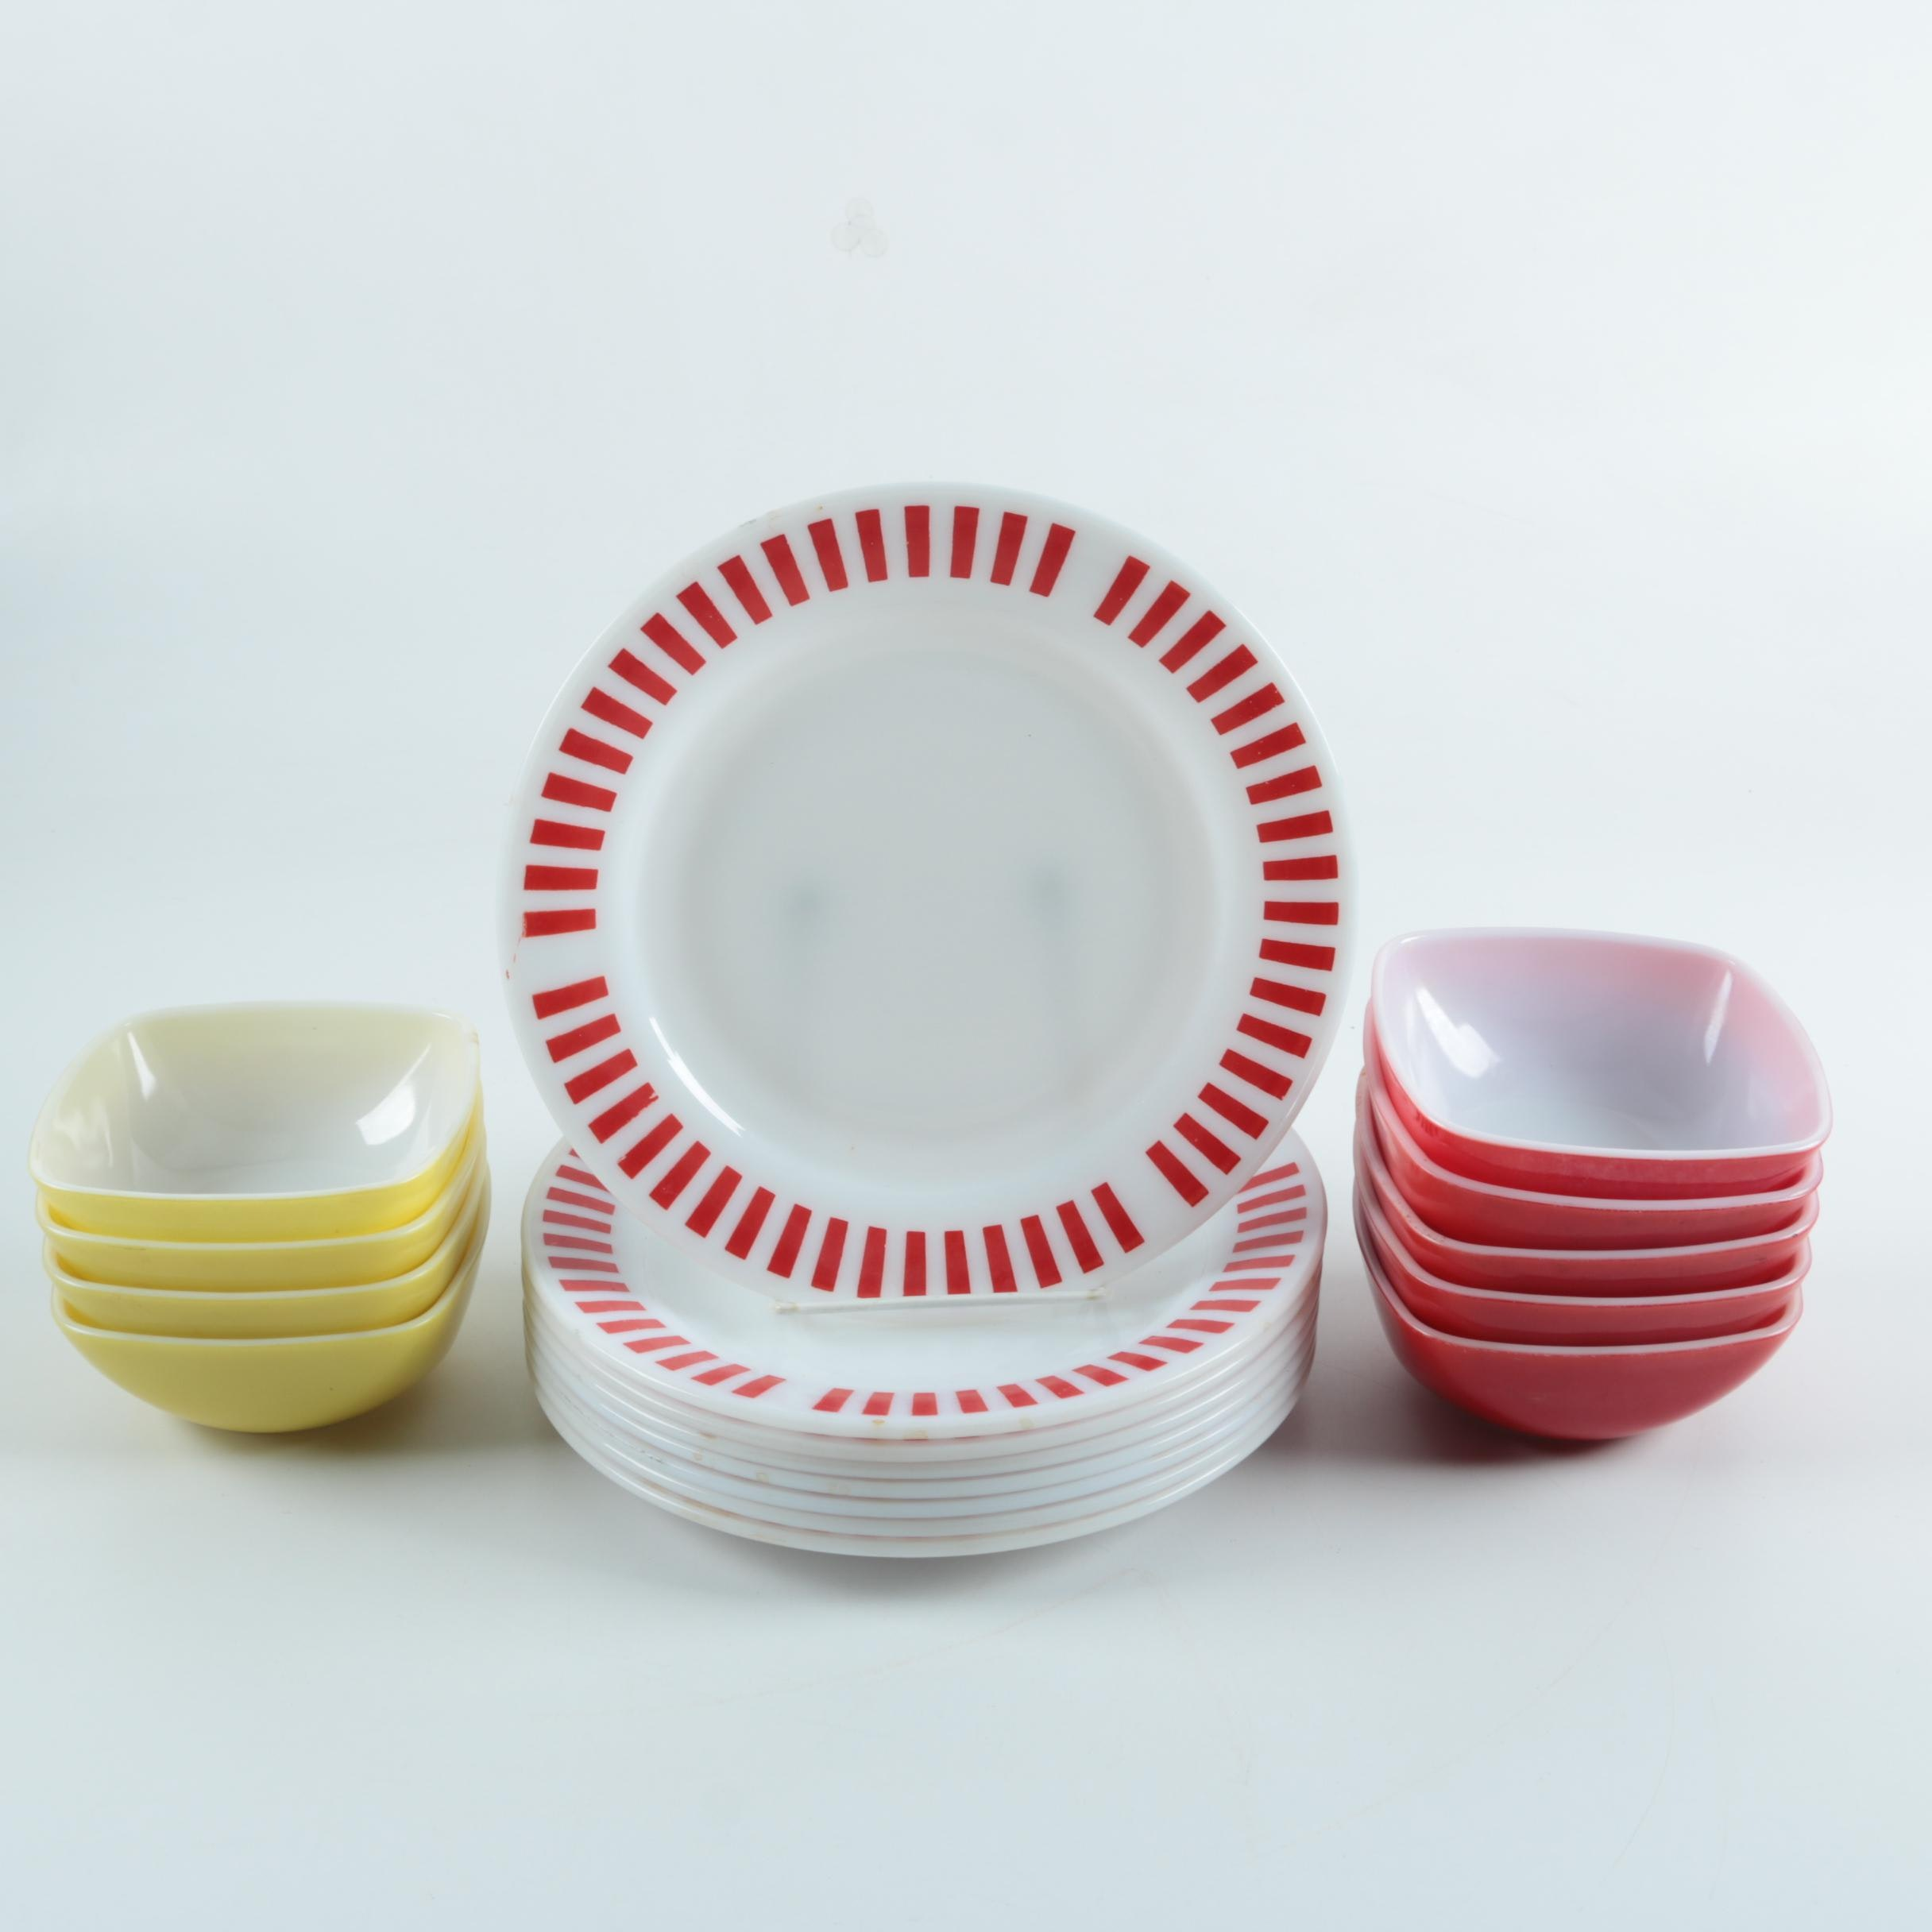 Hazel Atlas \ Candy Stripe\  Plates with Pyrex \ Primary Colors\  Square Bowls 1950s; 1x1; 1x1; 1x1; 1x1 ...  sc 1 st  EBTH.com & Hazel Atlas \